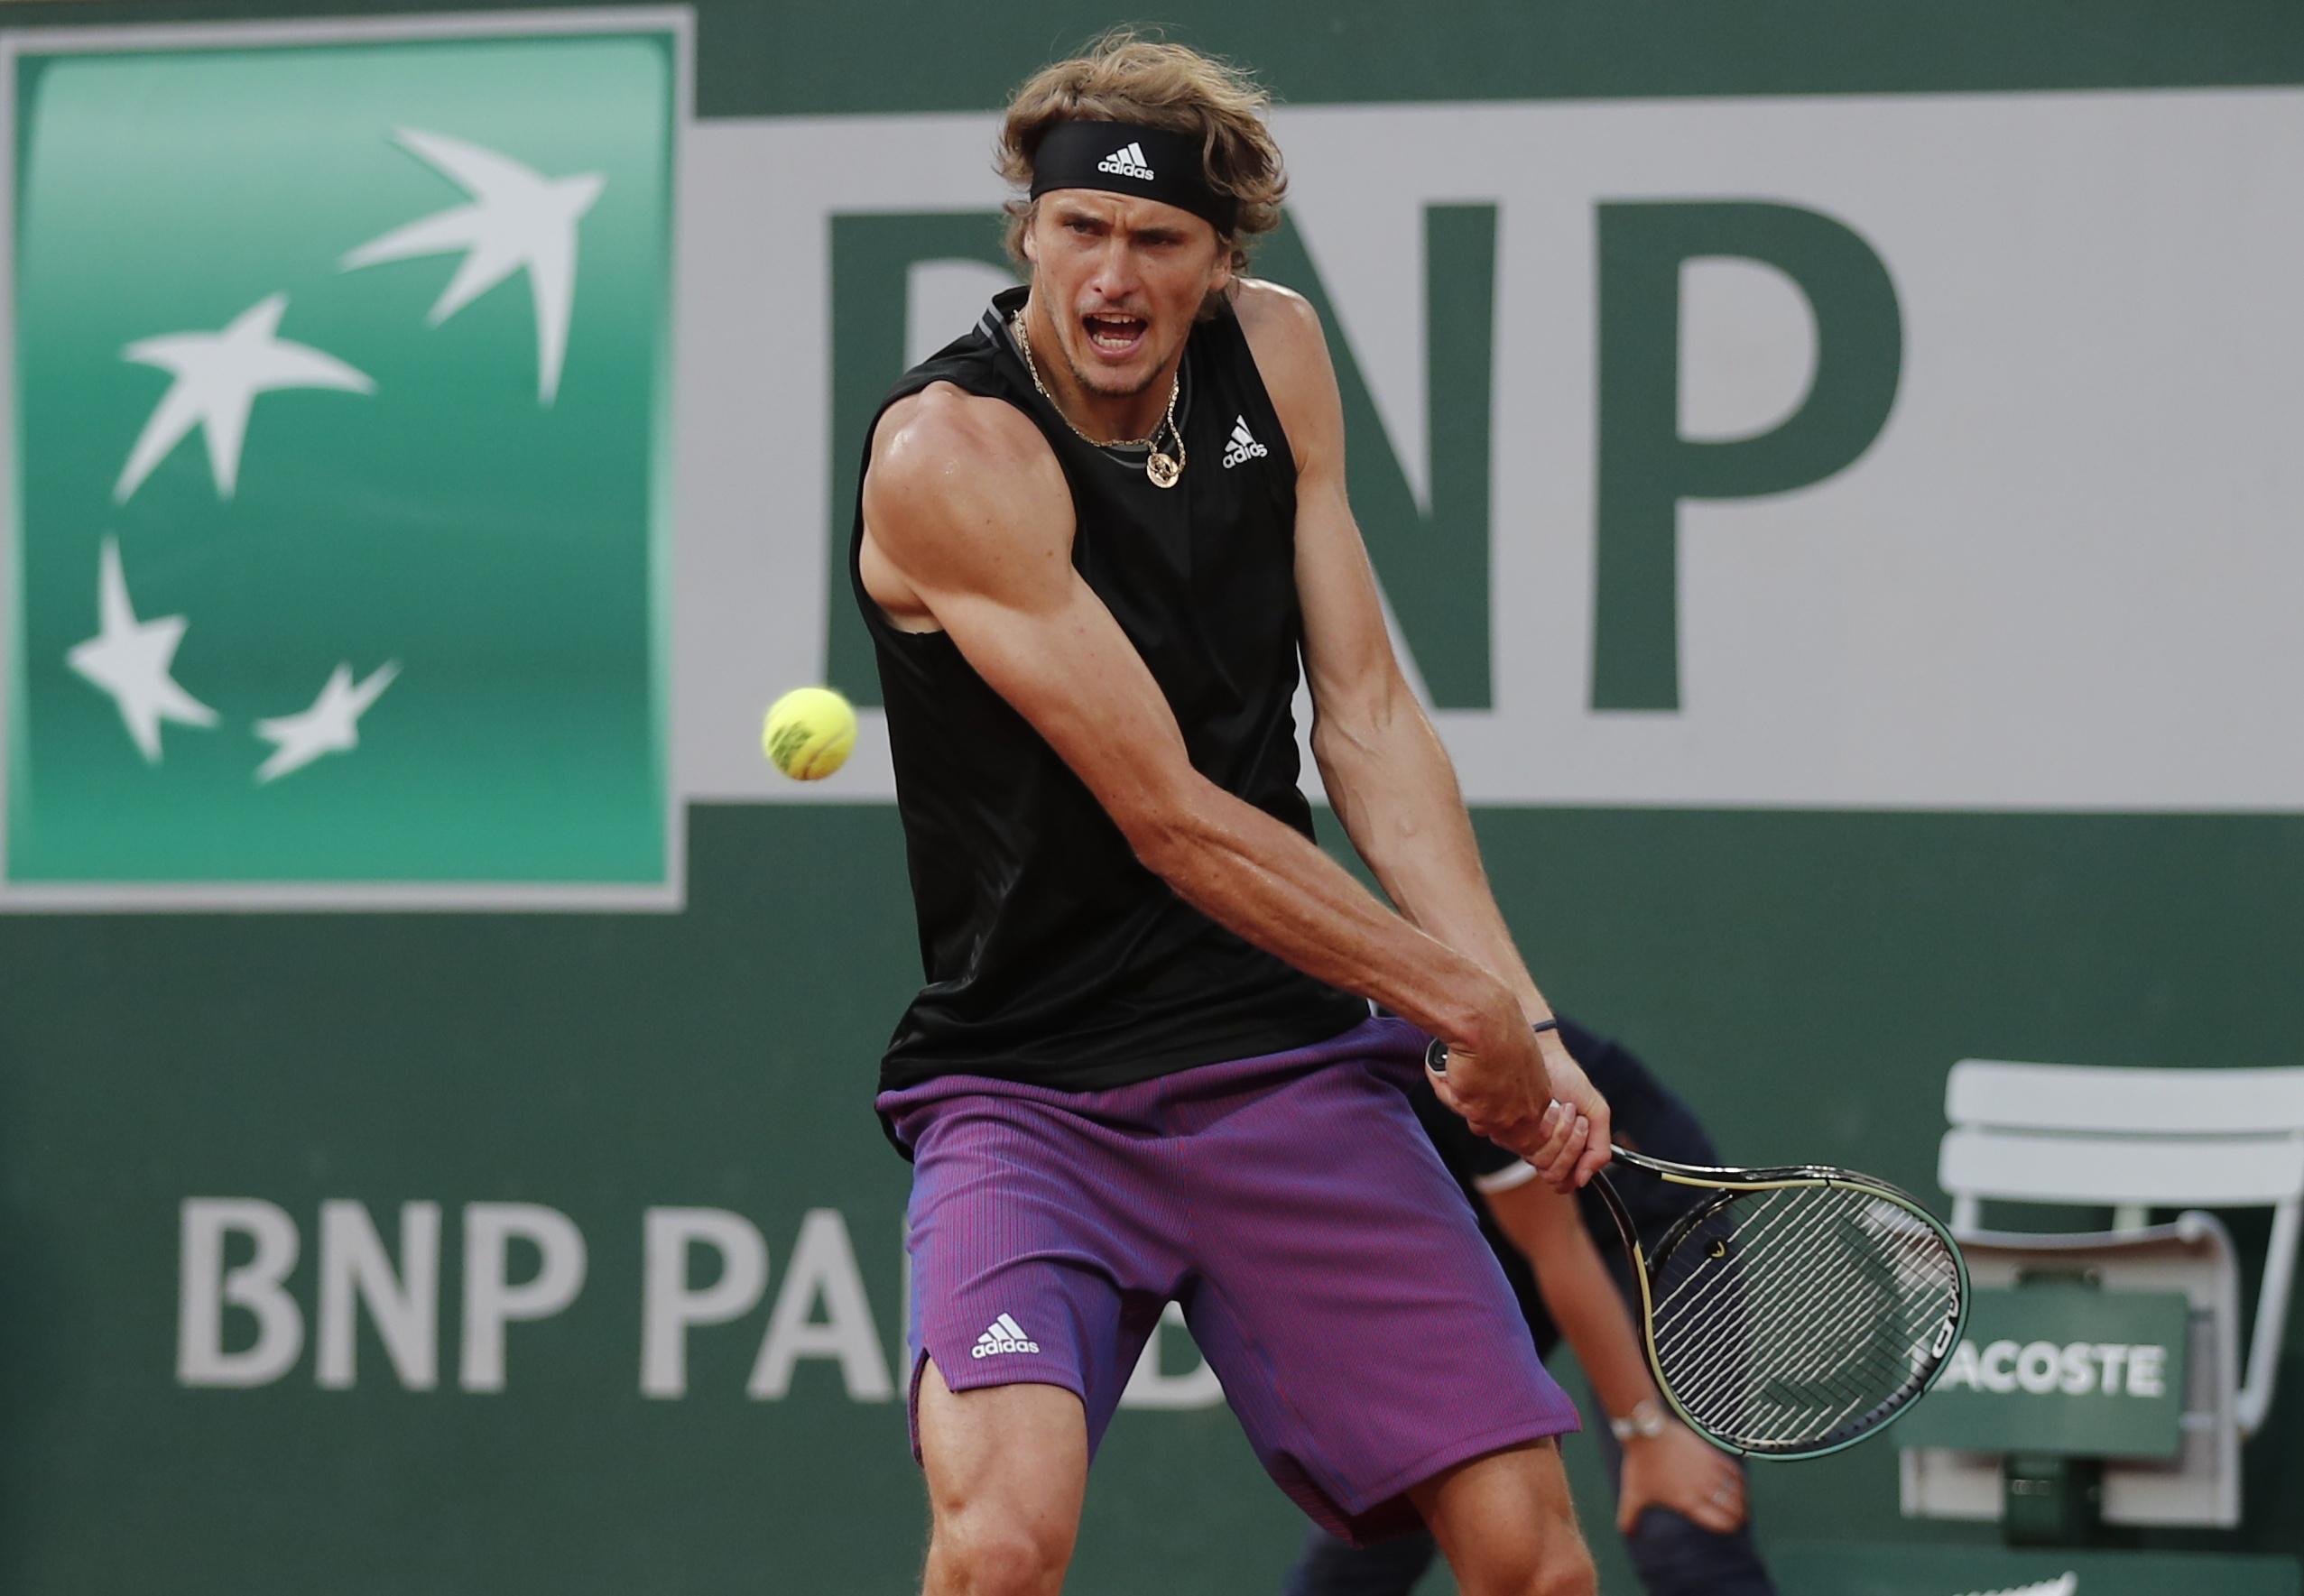 French Open 2021: Stefanos Tsitsipas vs. Alexander Zverev Tennis Pick and Prediction